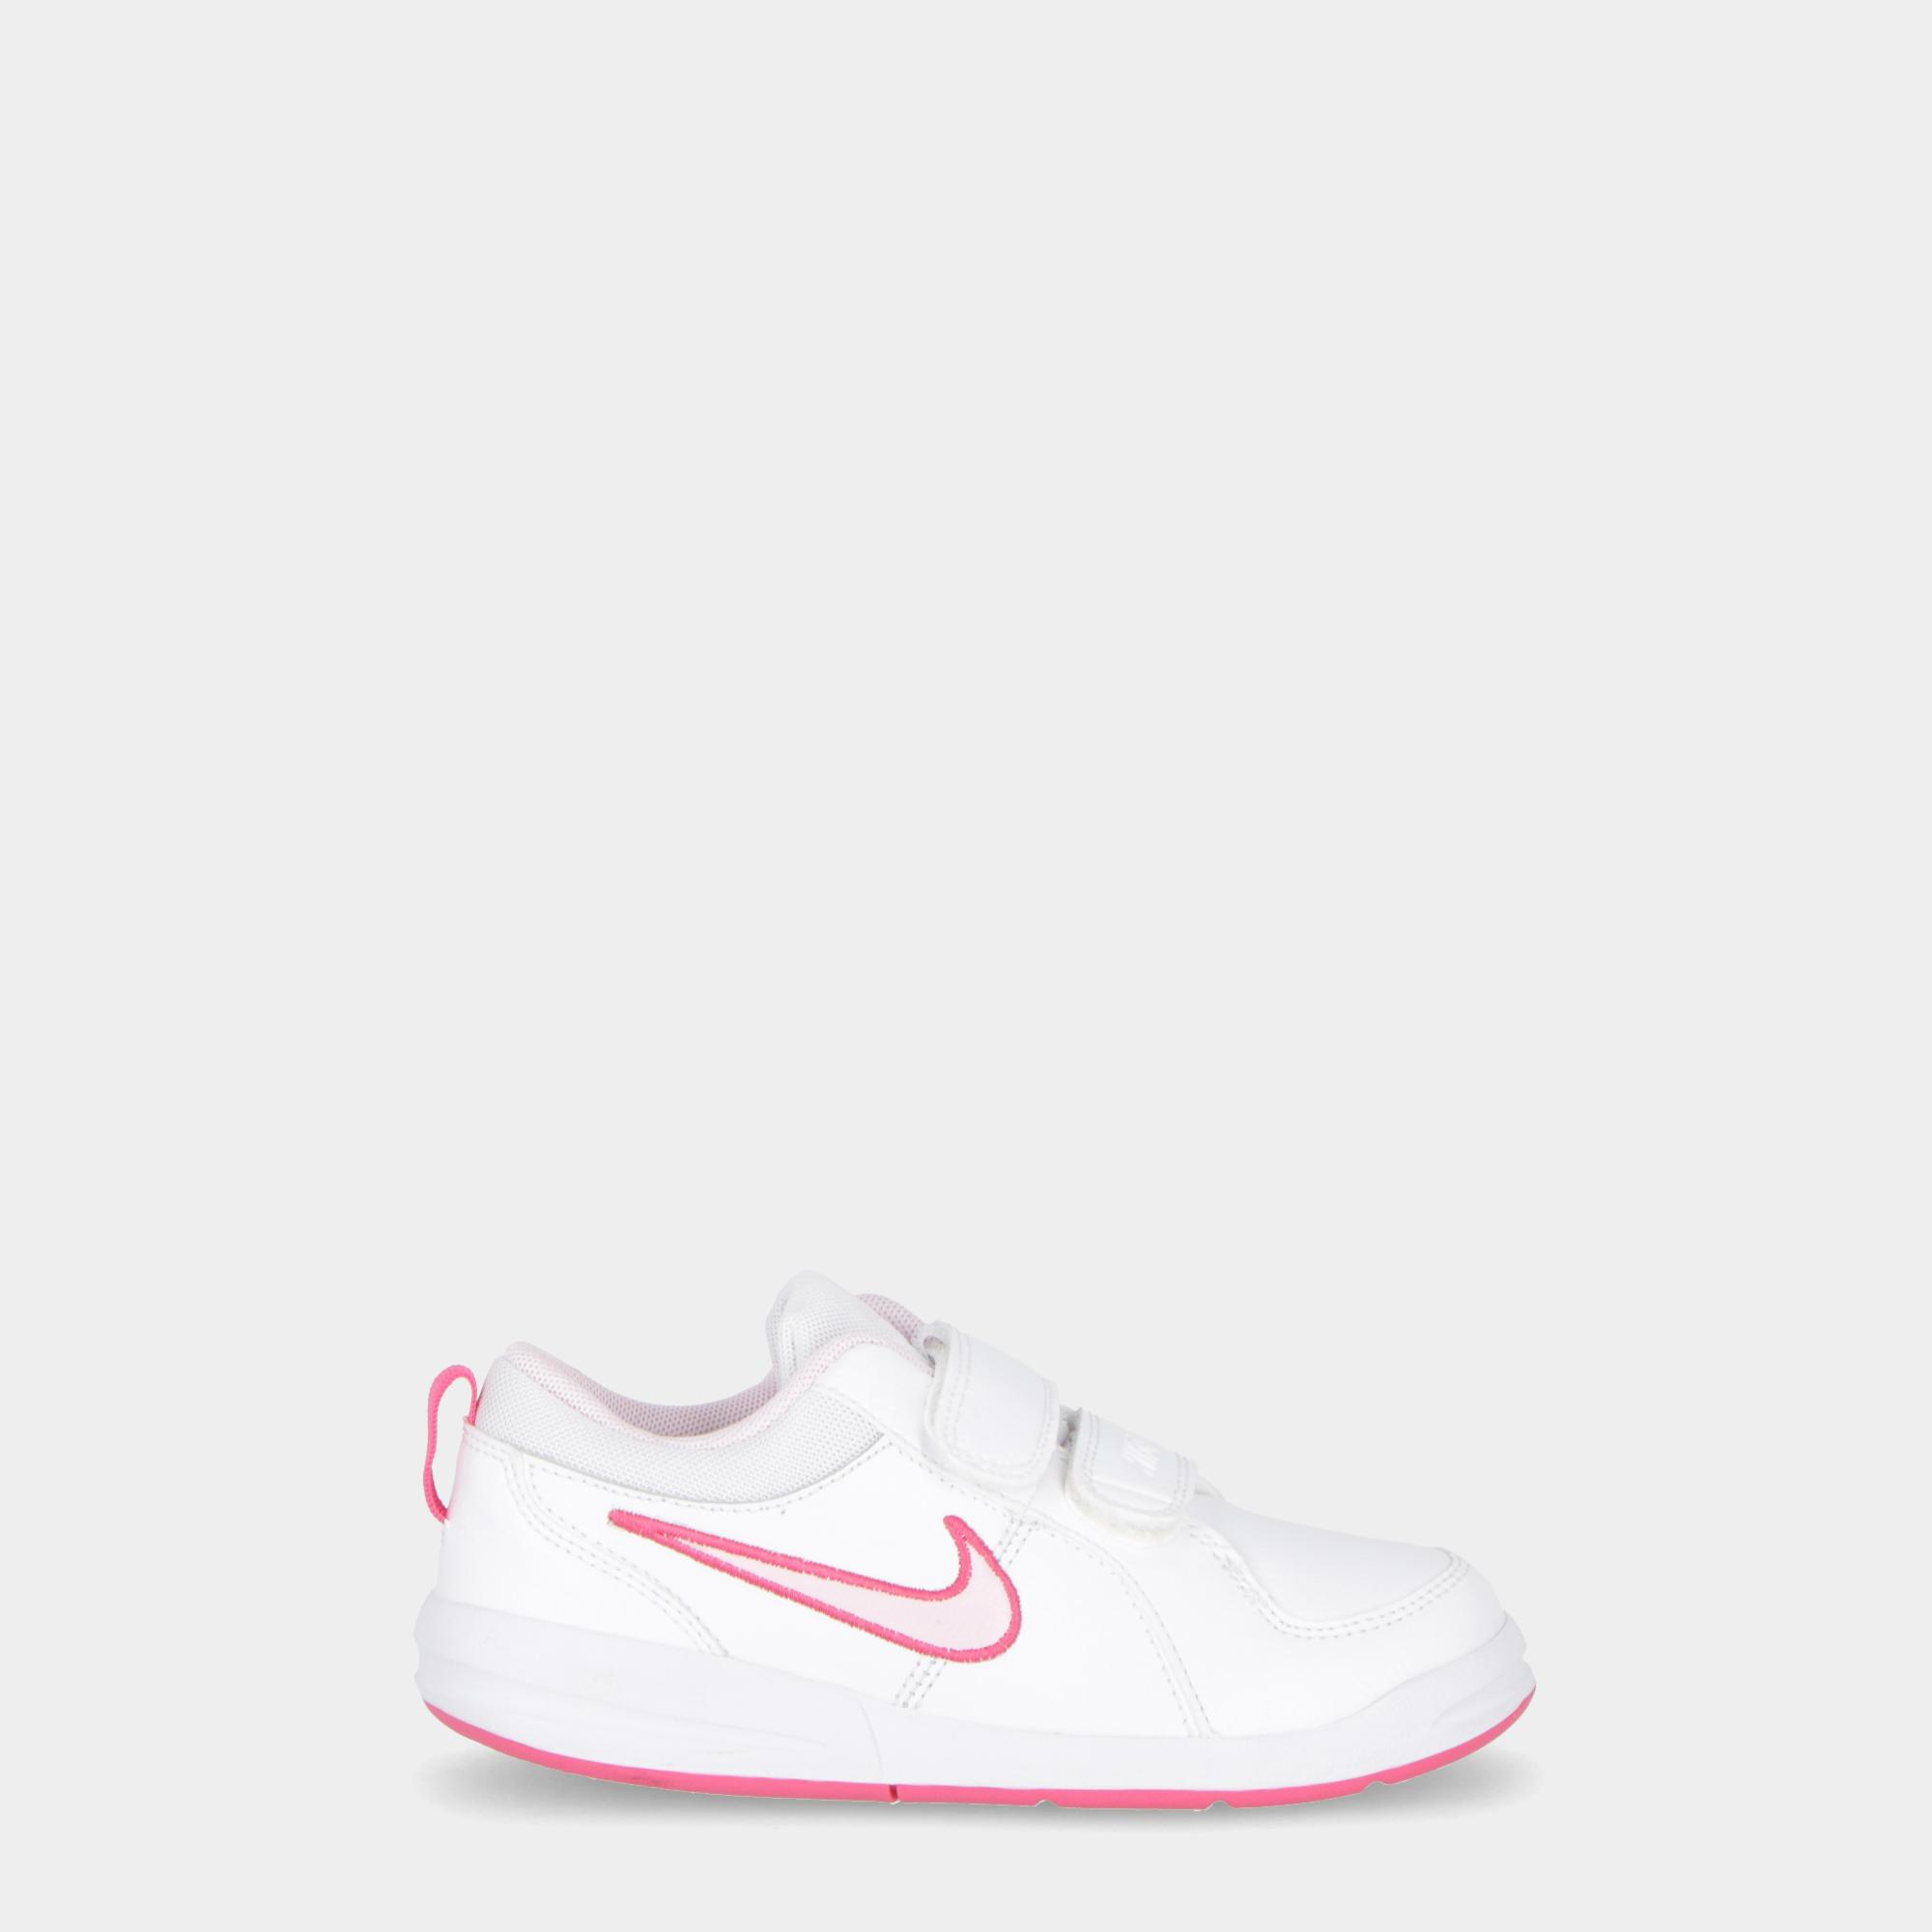 ebba948824 Nike Pico 4 (psv) - Kids<br/> White/pink   Treesse